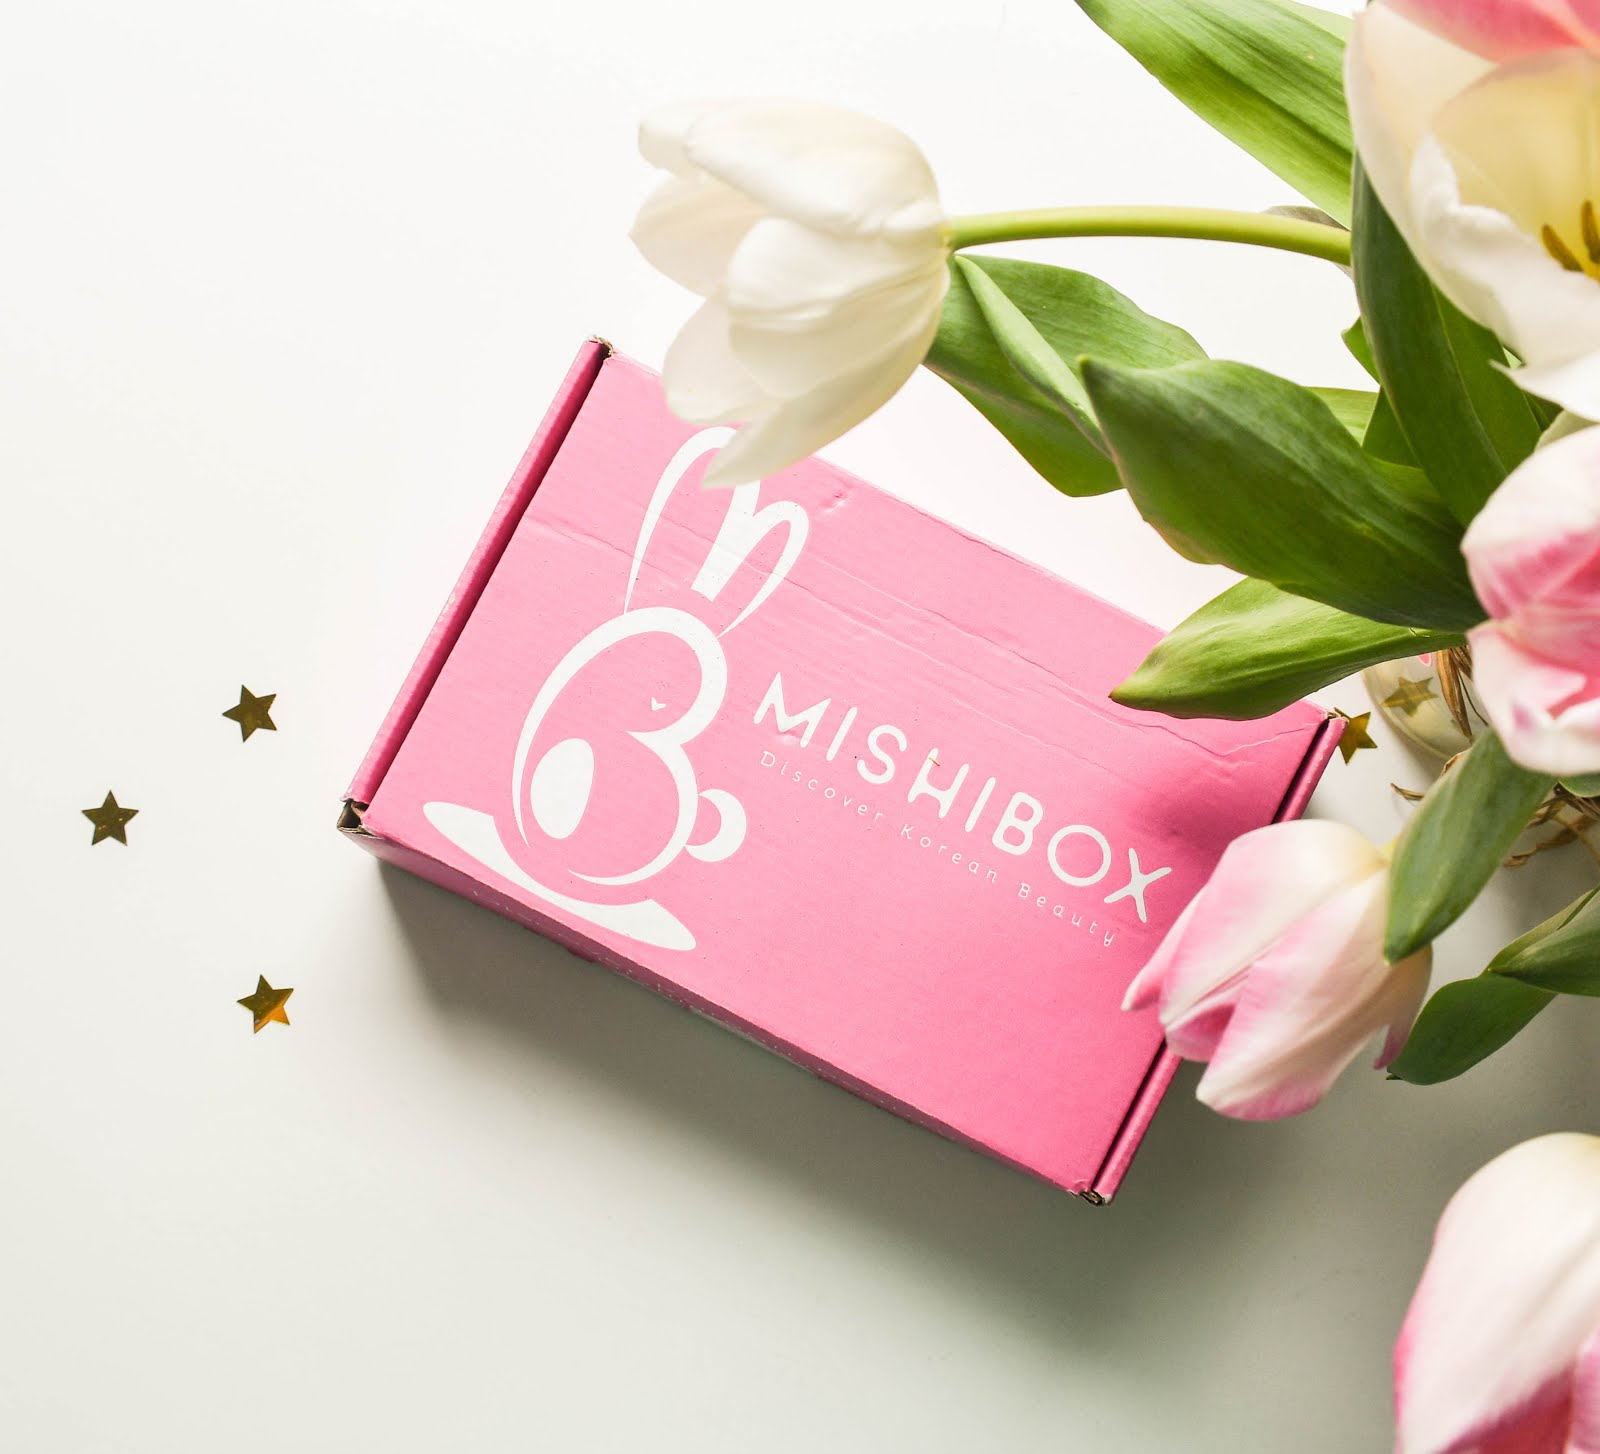 Mishibox - April 2018 Review   Korean Beauty Subscription Box ...